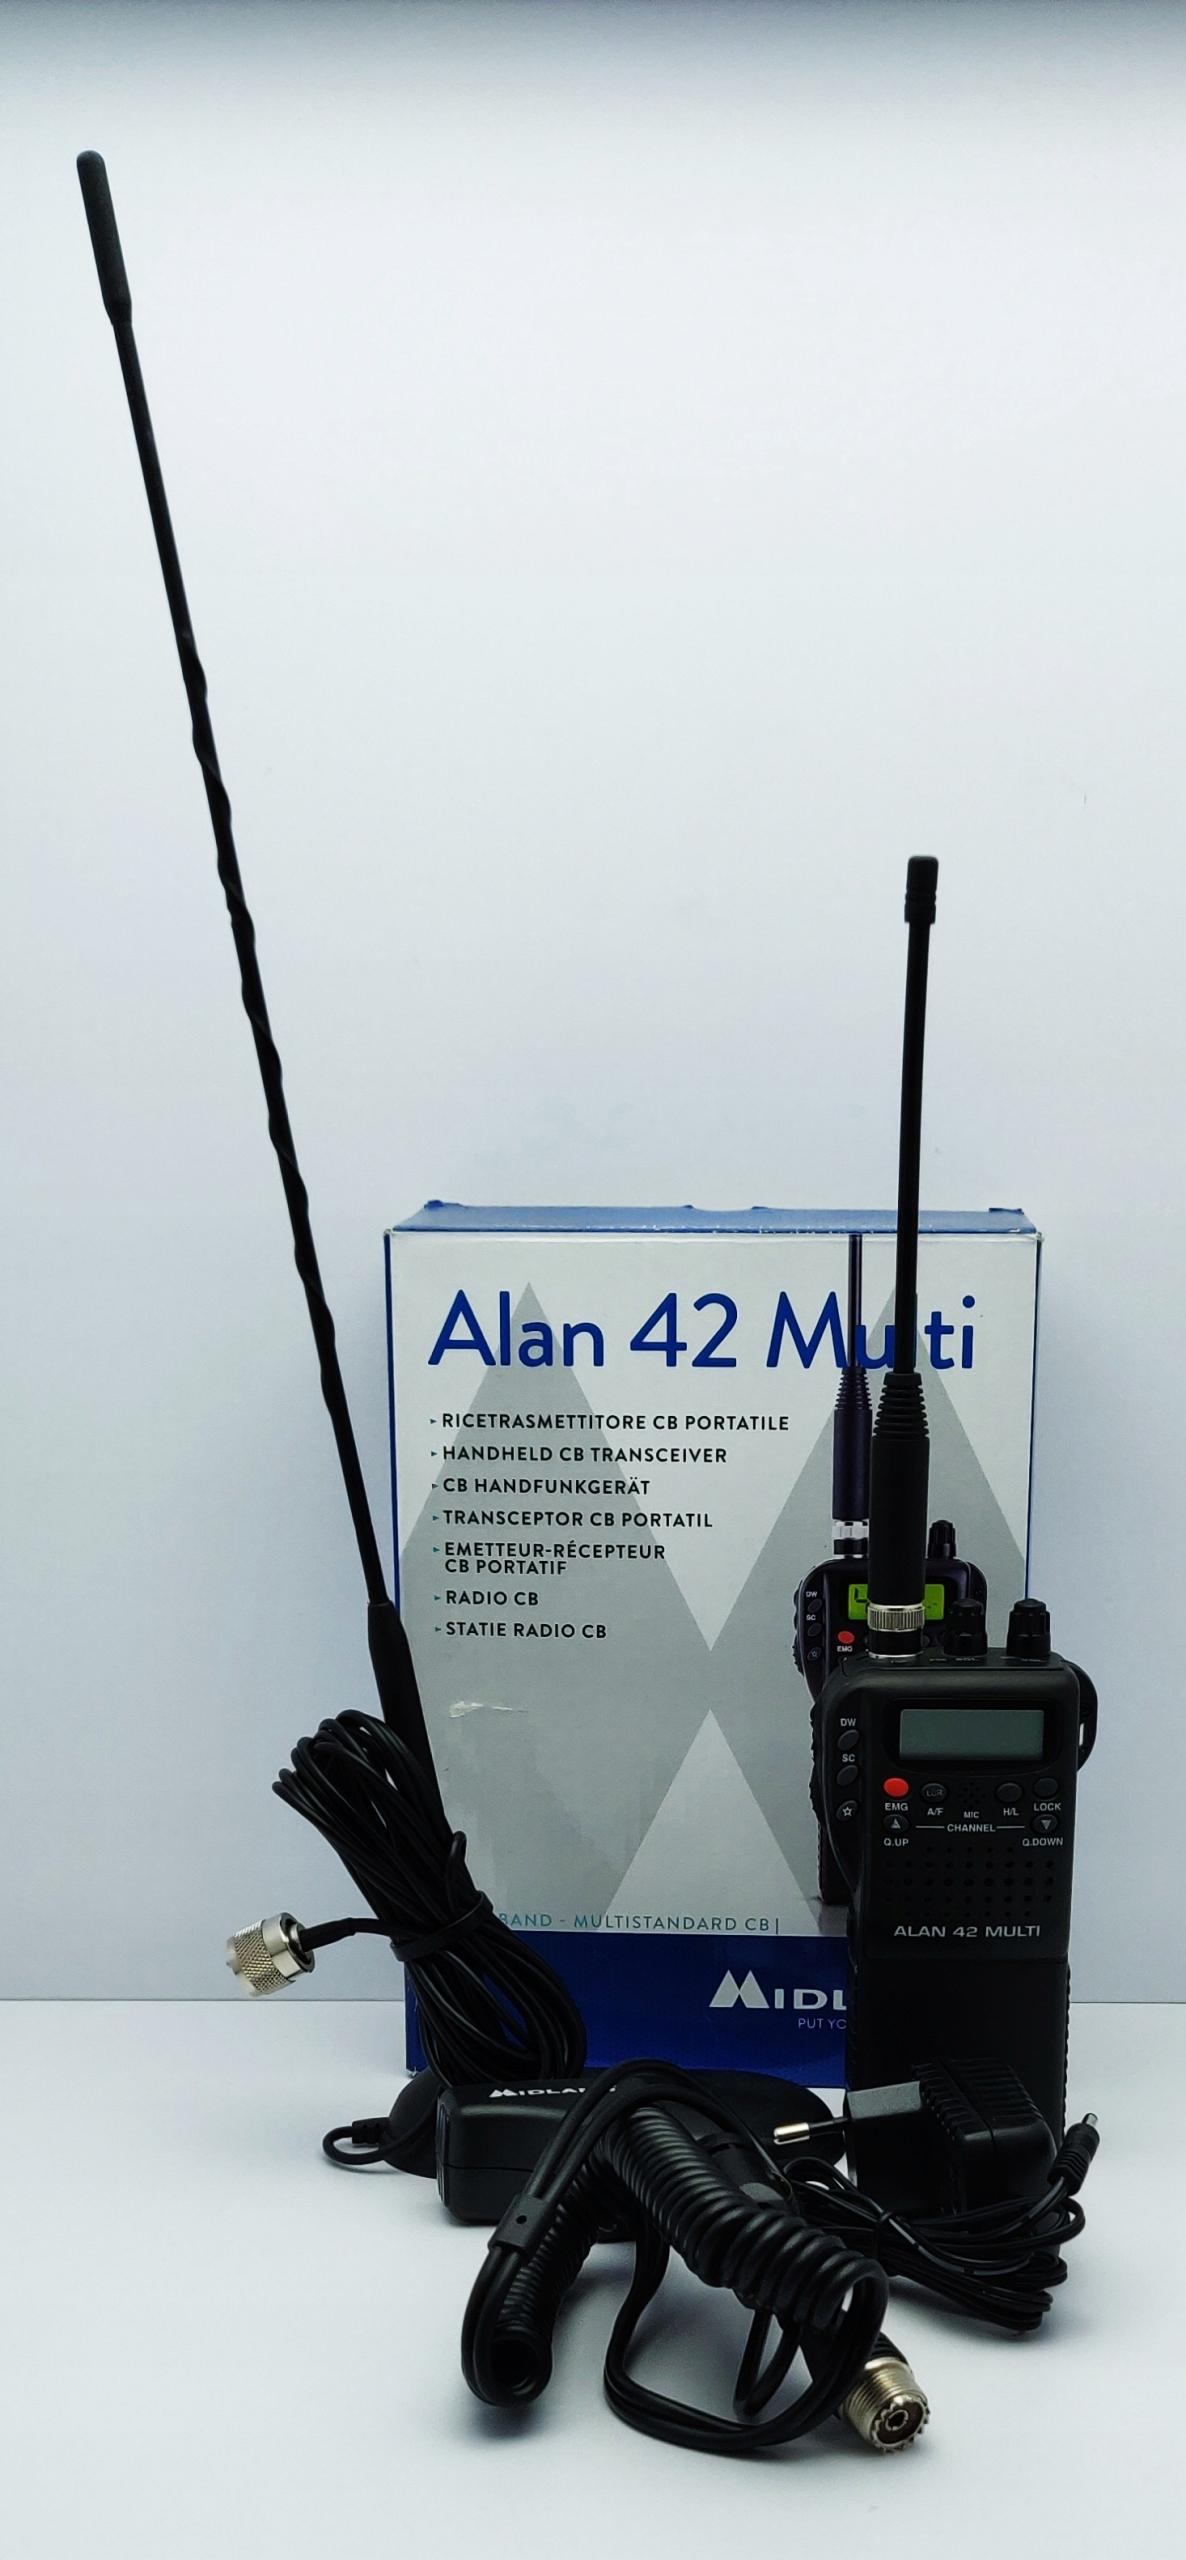 CB RADIO MIDLAND ALAN 42 MULTI LOMBARD66